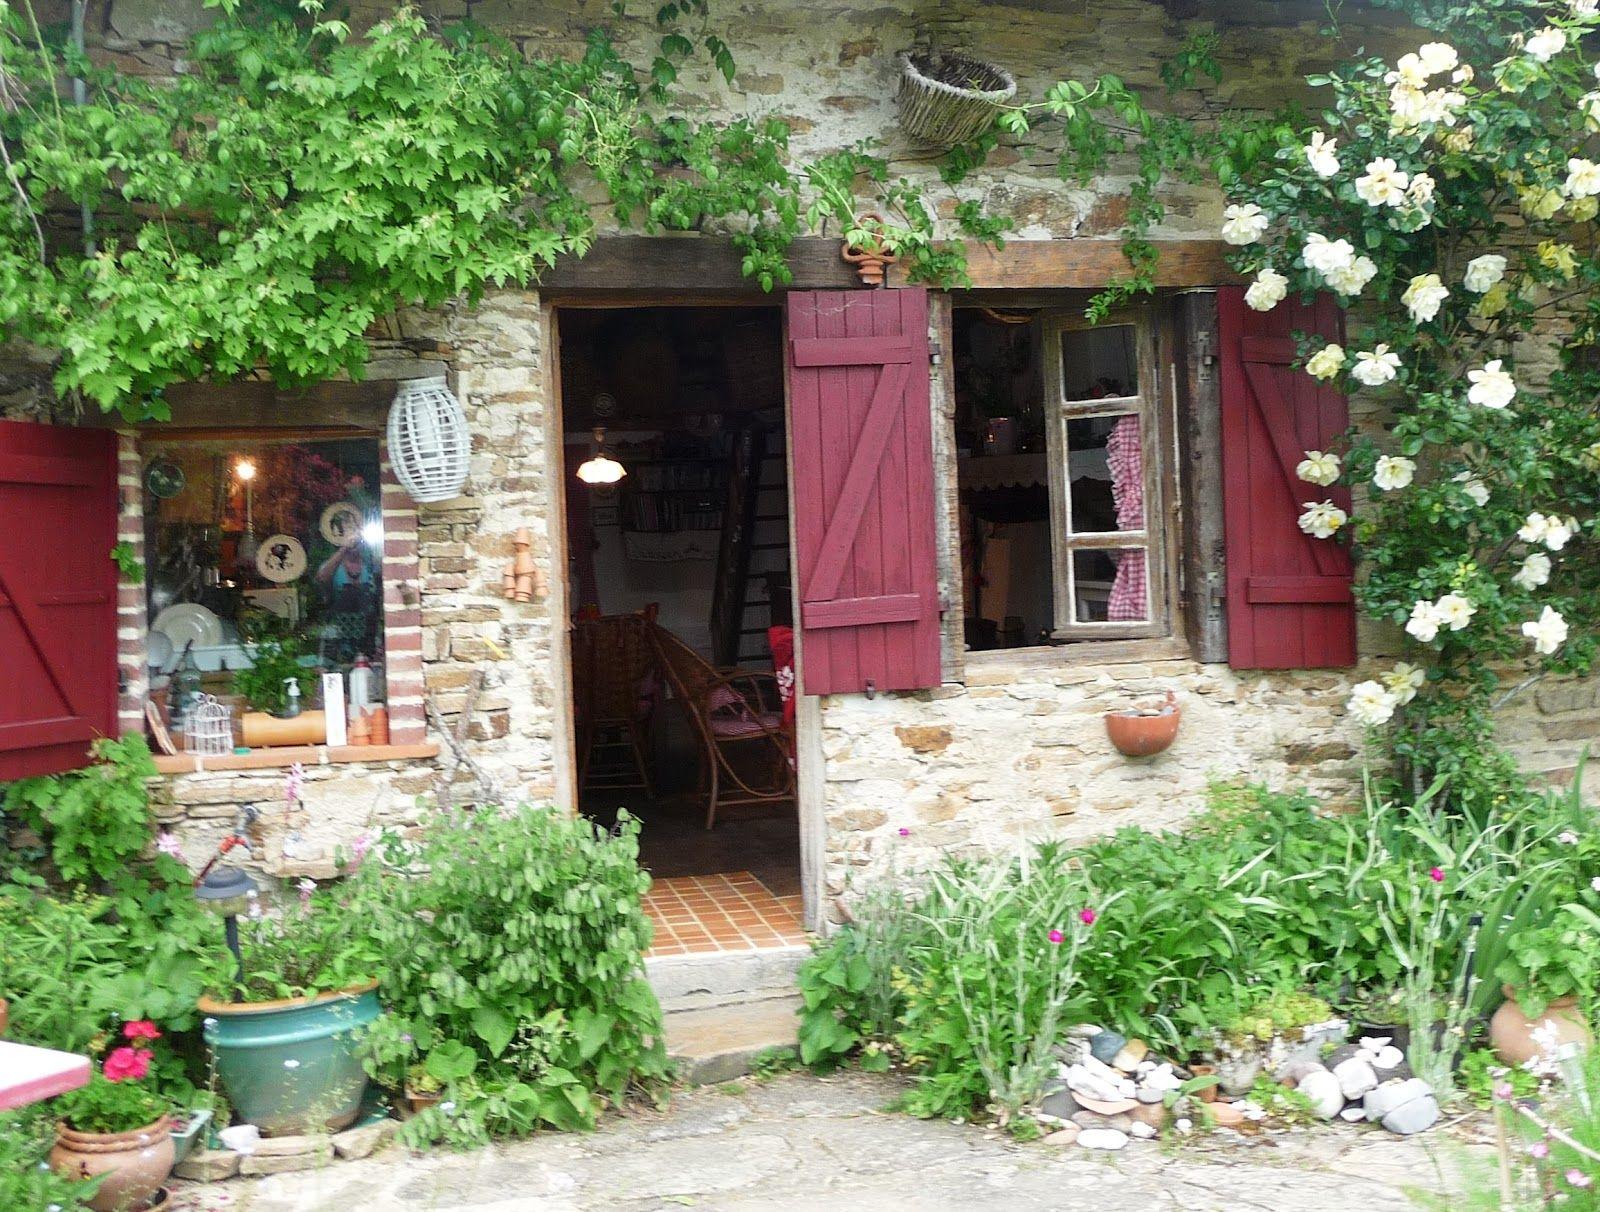 French Windows French Country Garden Country Garden Decor